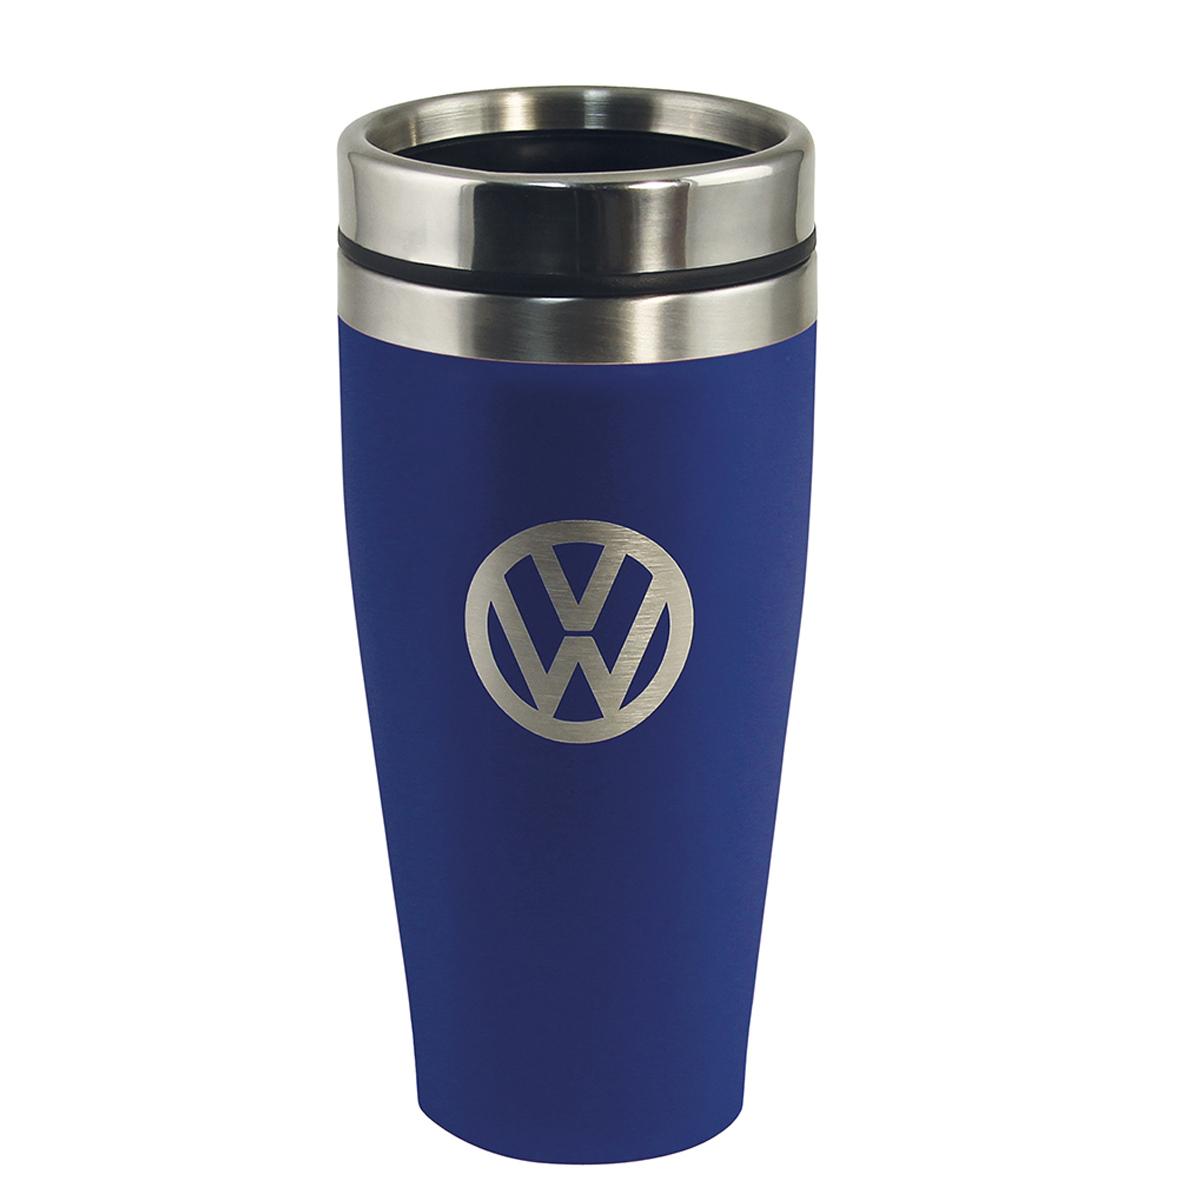 Mug de transport isotherme \'Volkswagen\' bleu gris - 17x7 cm (40 cl) - [Q1989]